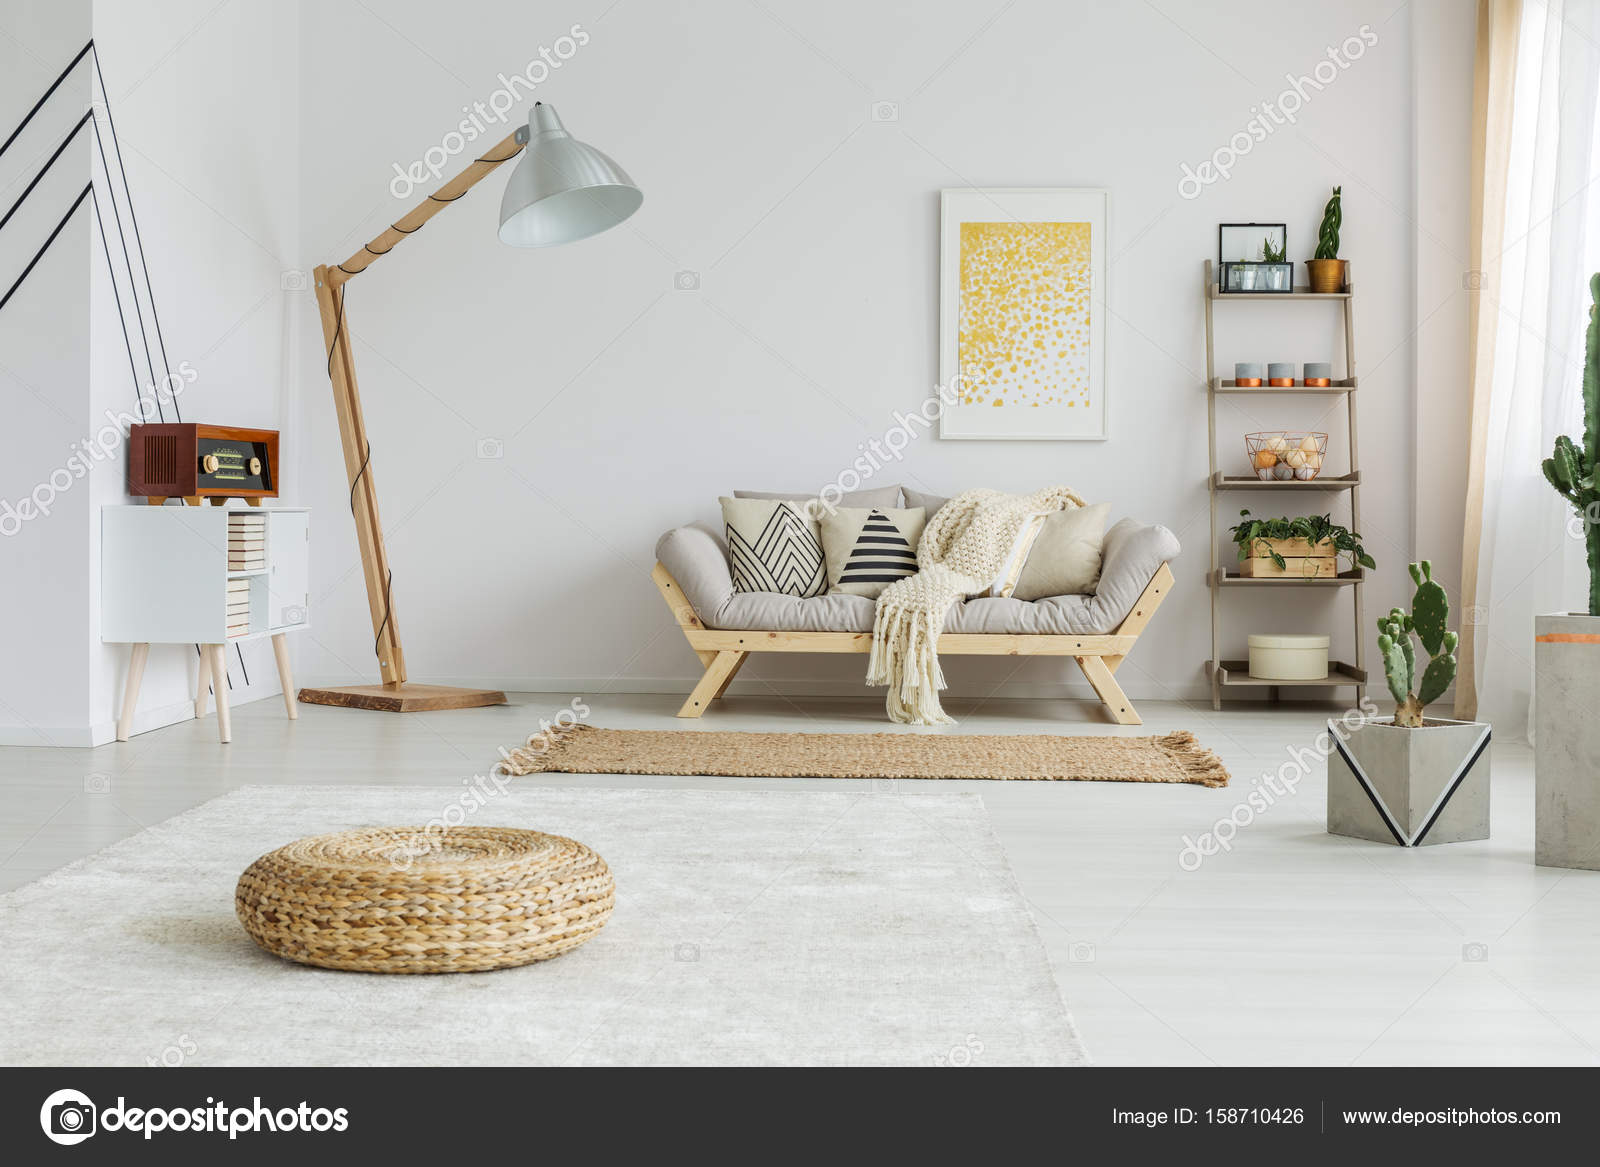 Carpet and rug — Stock Photo © photographee.eu #158710426